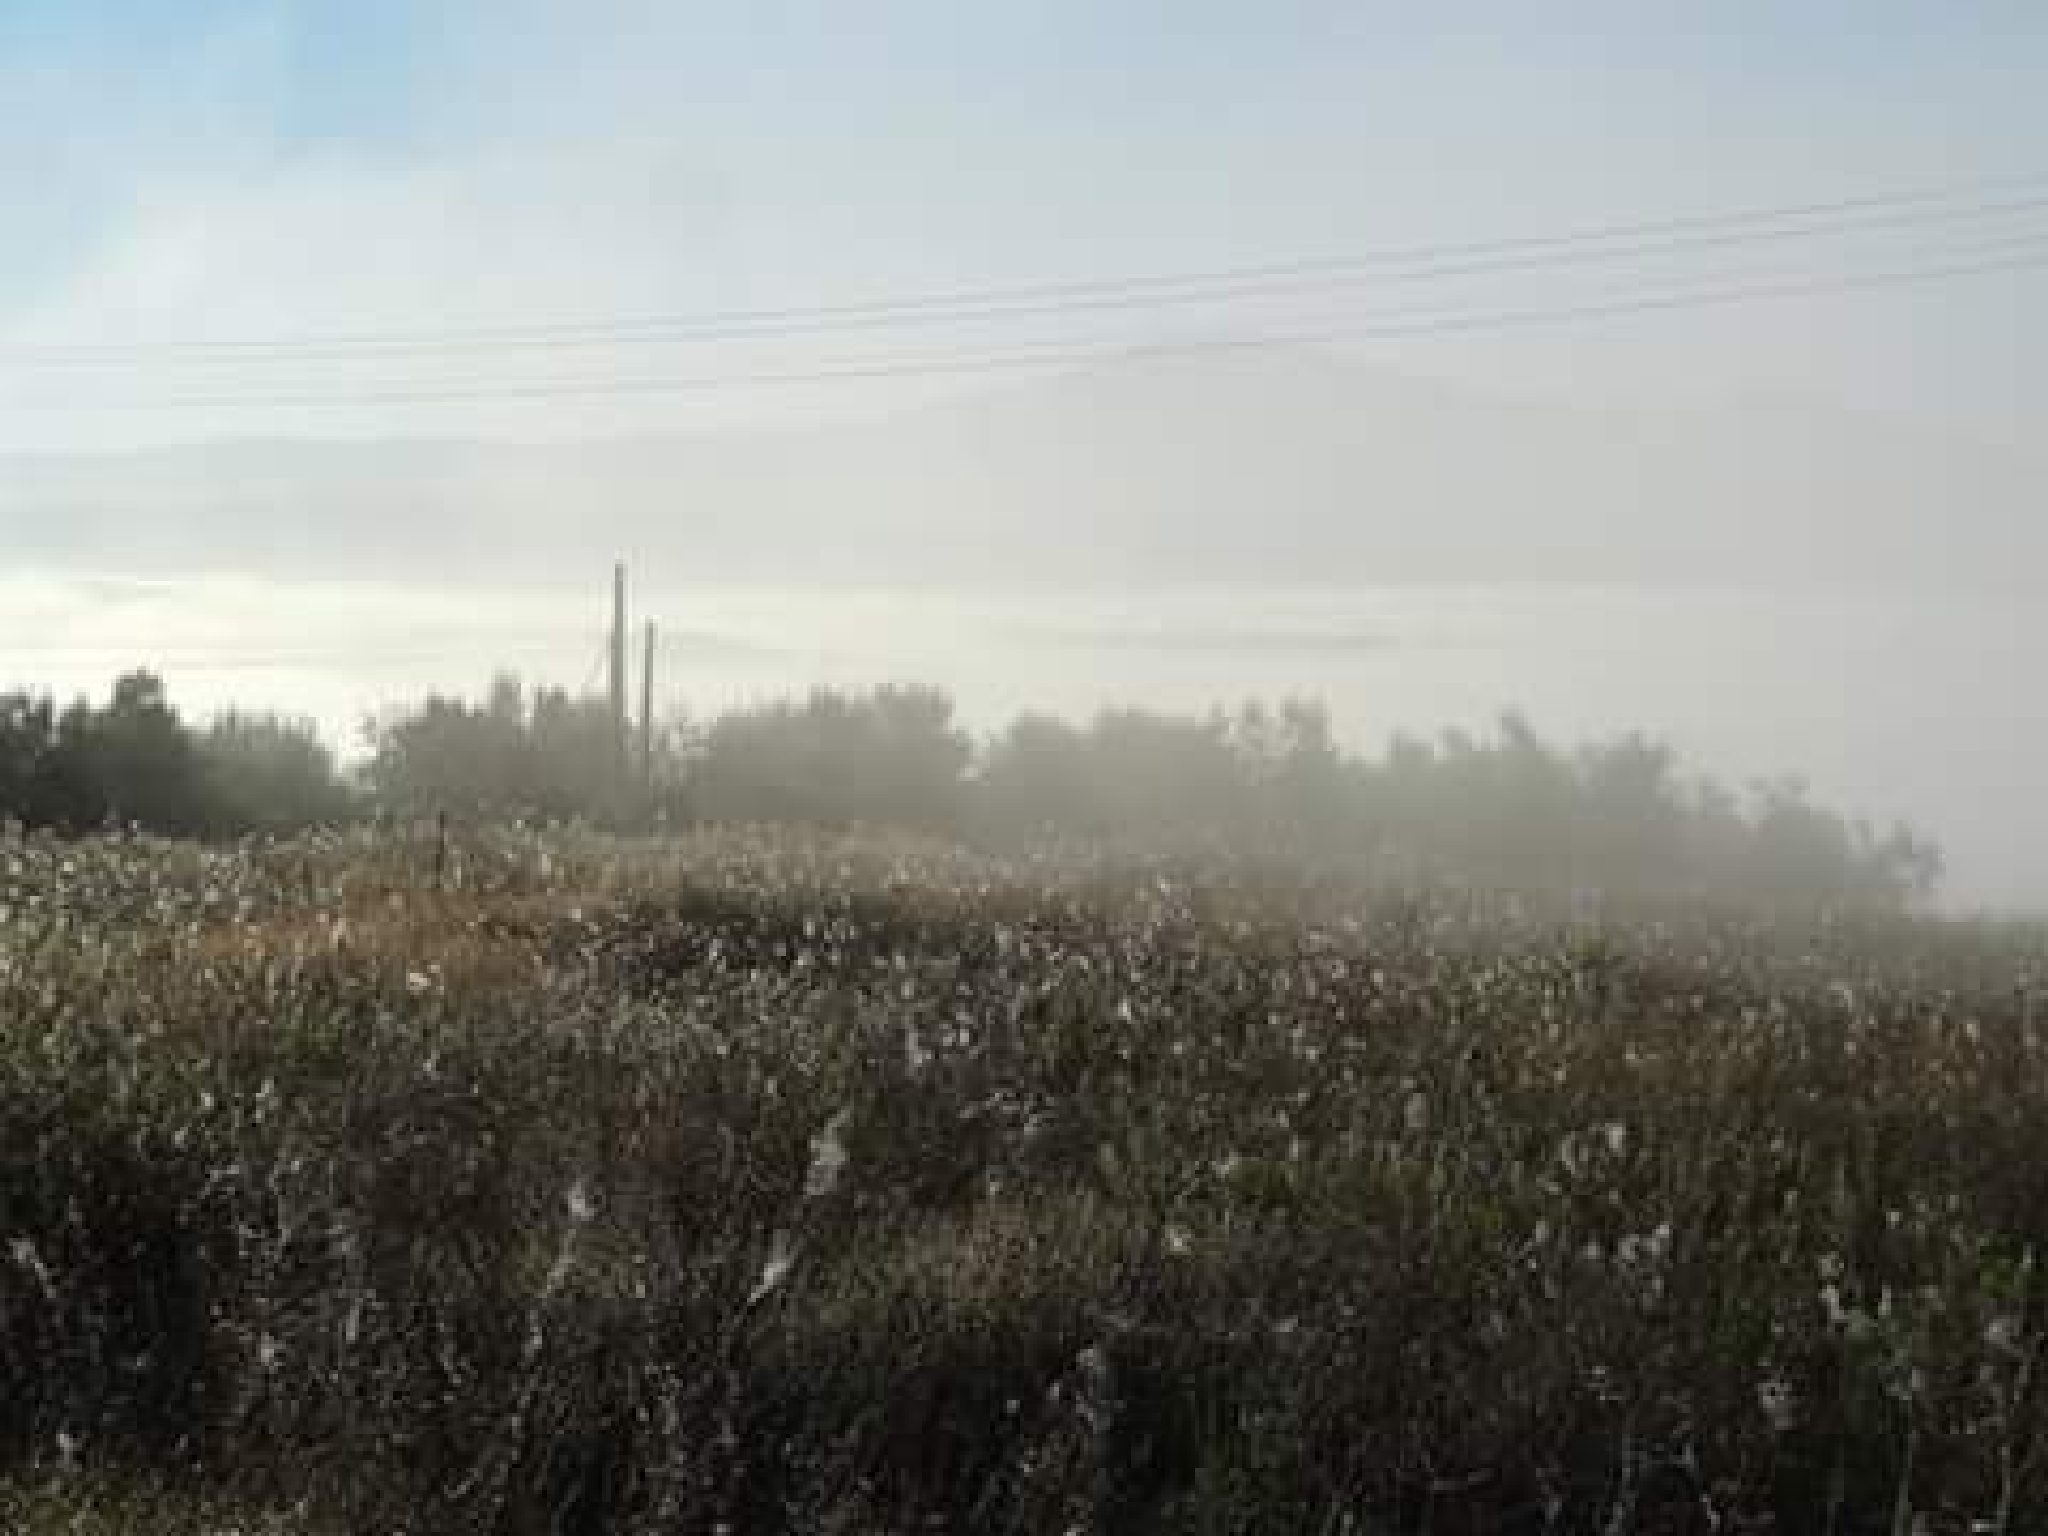 Olives in autumn fog  by Matteo Venturini